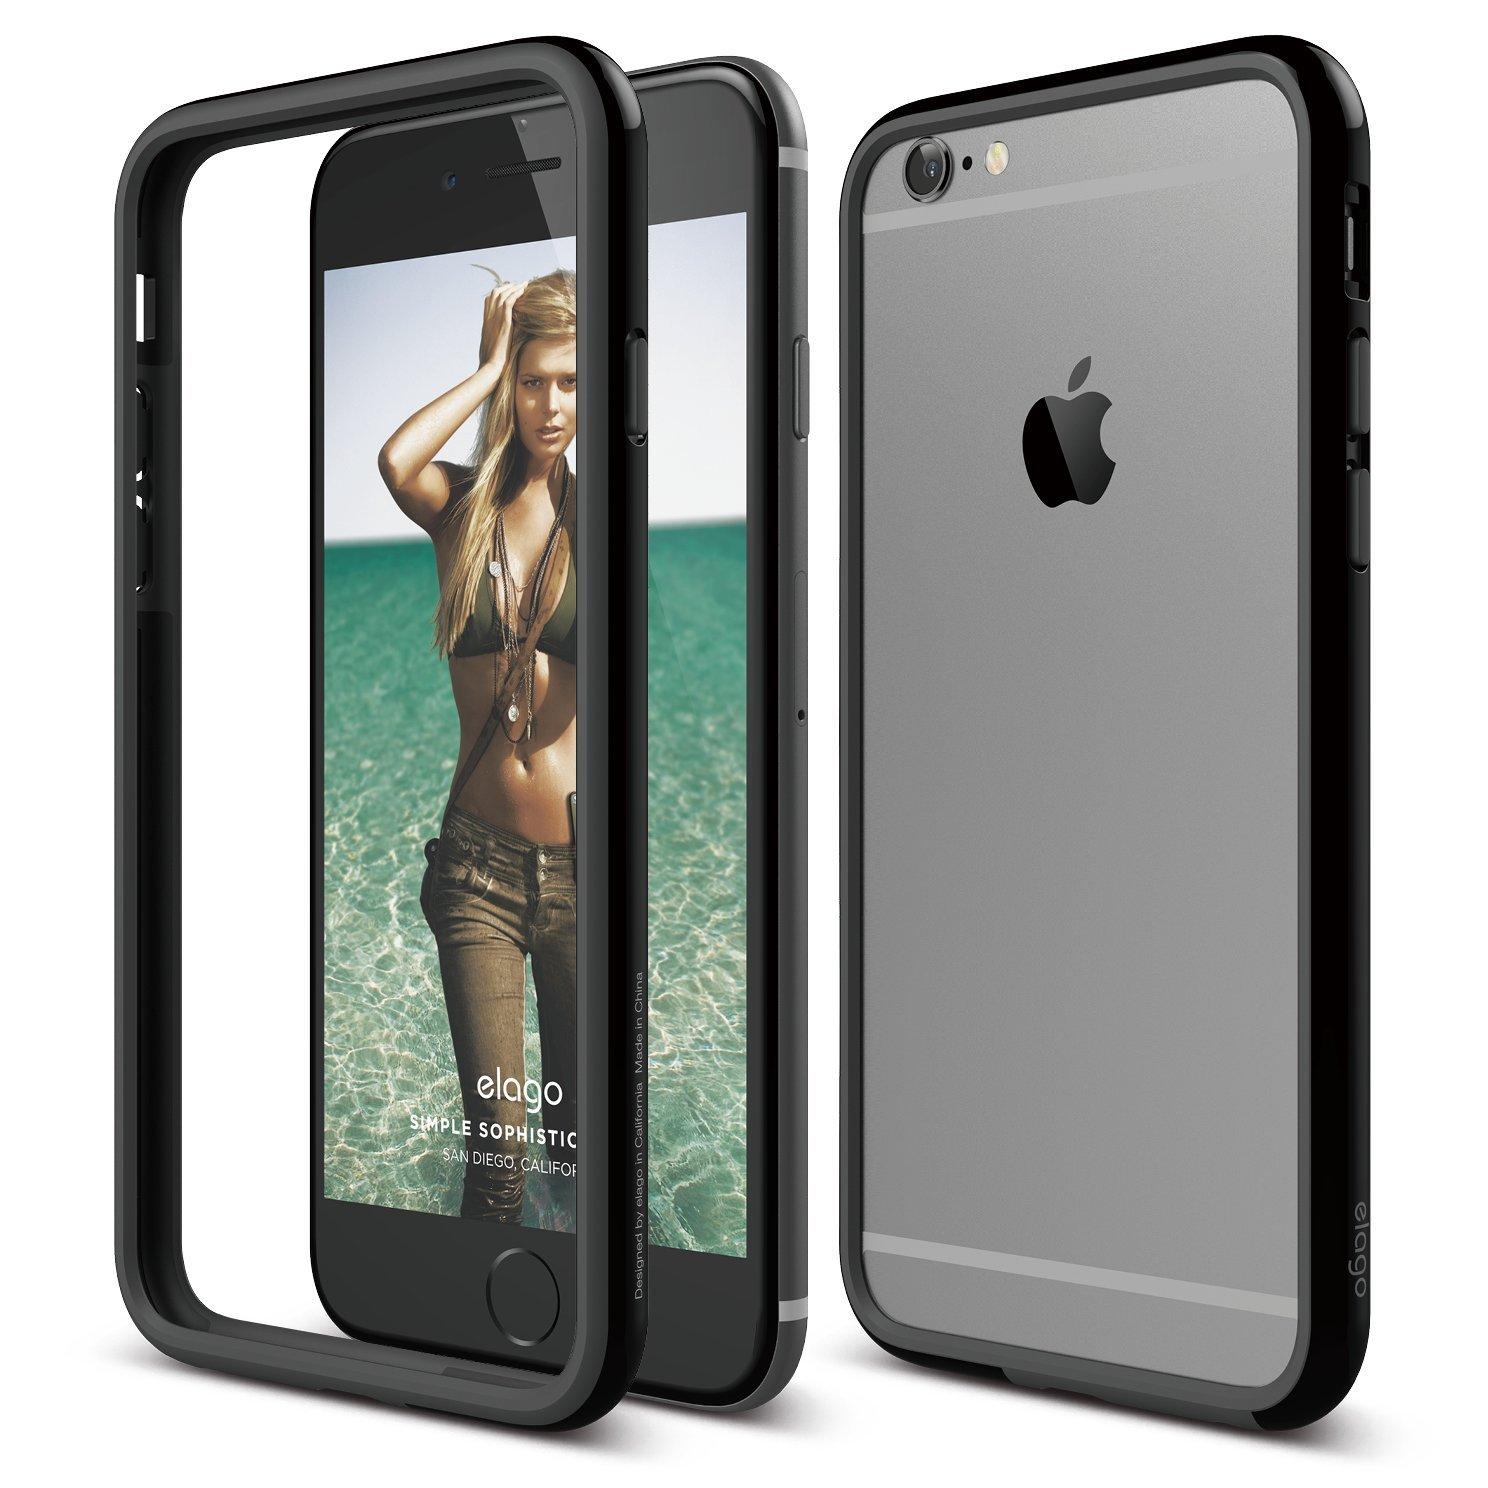 S6 Bumper Case for iPhone 6/6s Plus - Black « Back